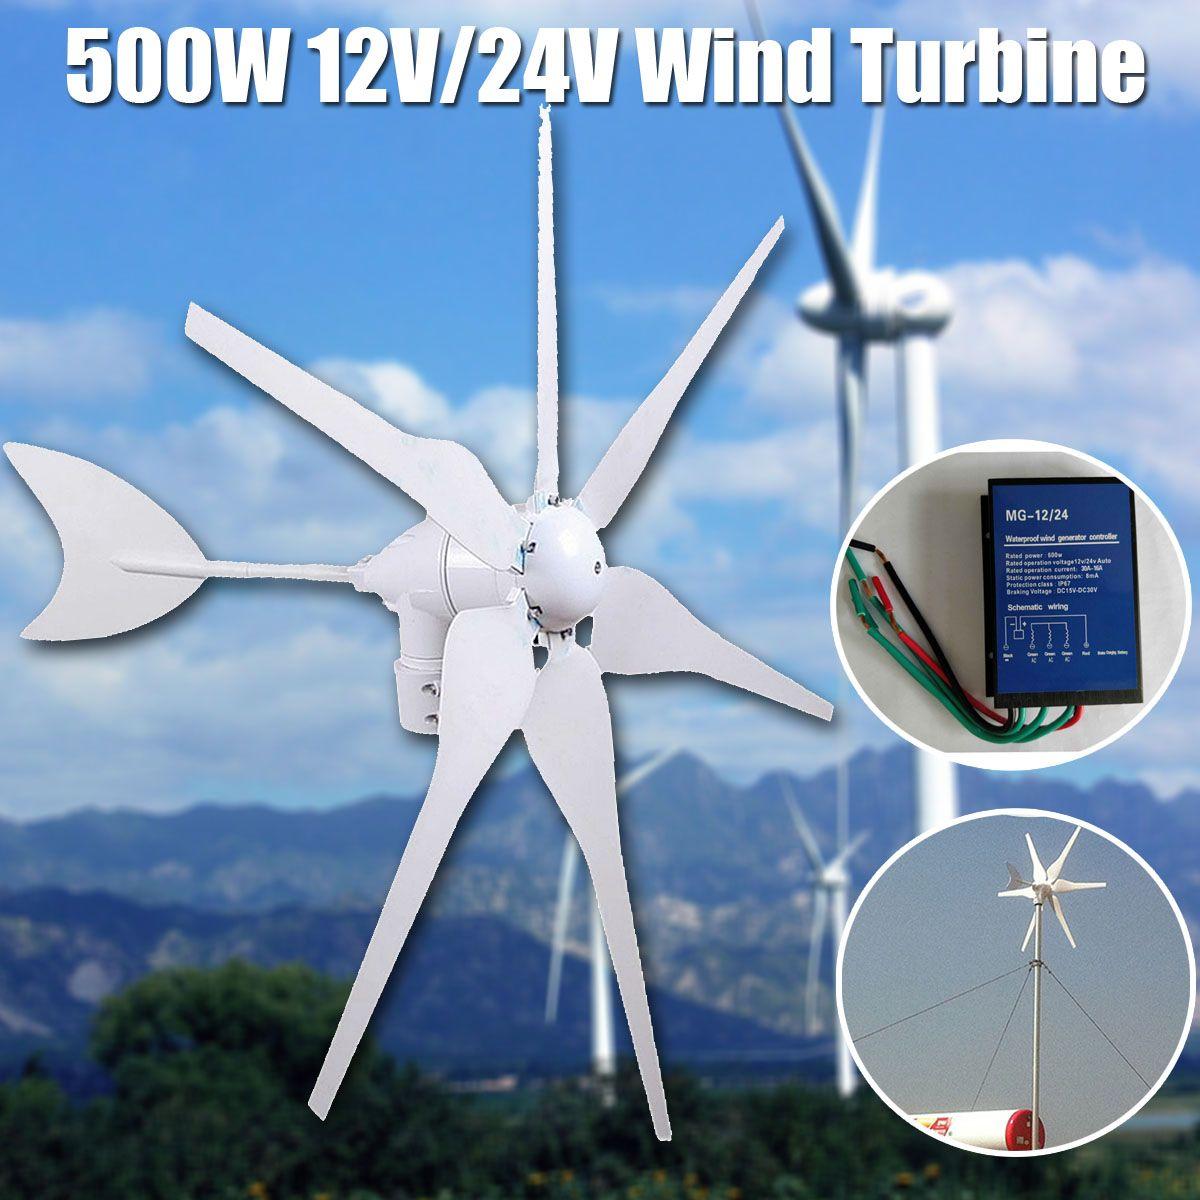 500W 12V/24V Environmental 6 Blades Miniature Wind Turbine Mini Wind Turbine Energy Generator Residential Home With Controller